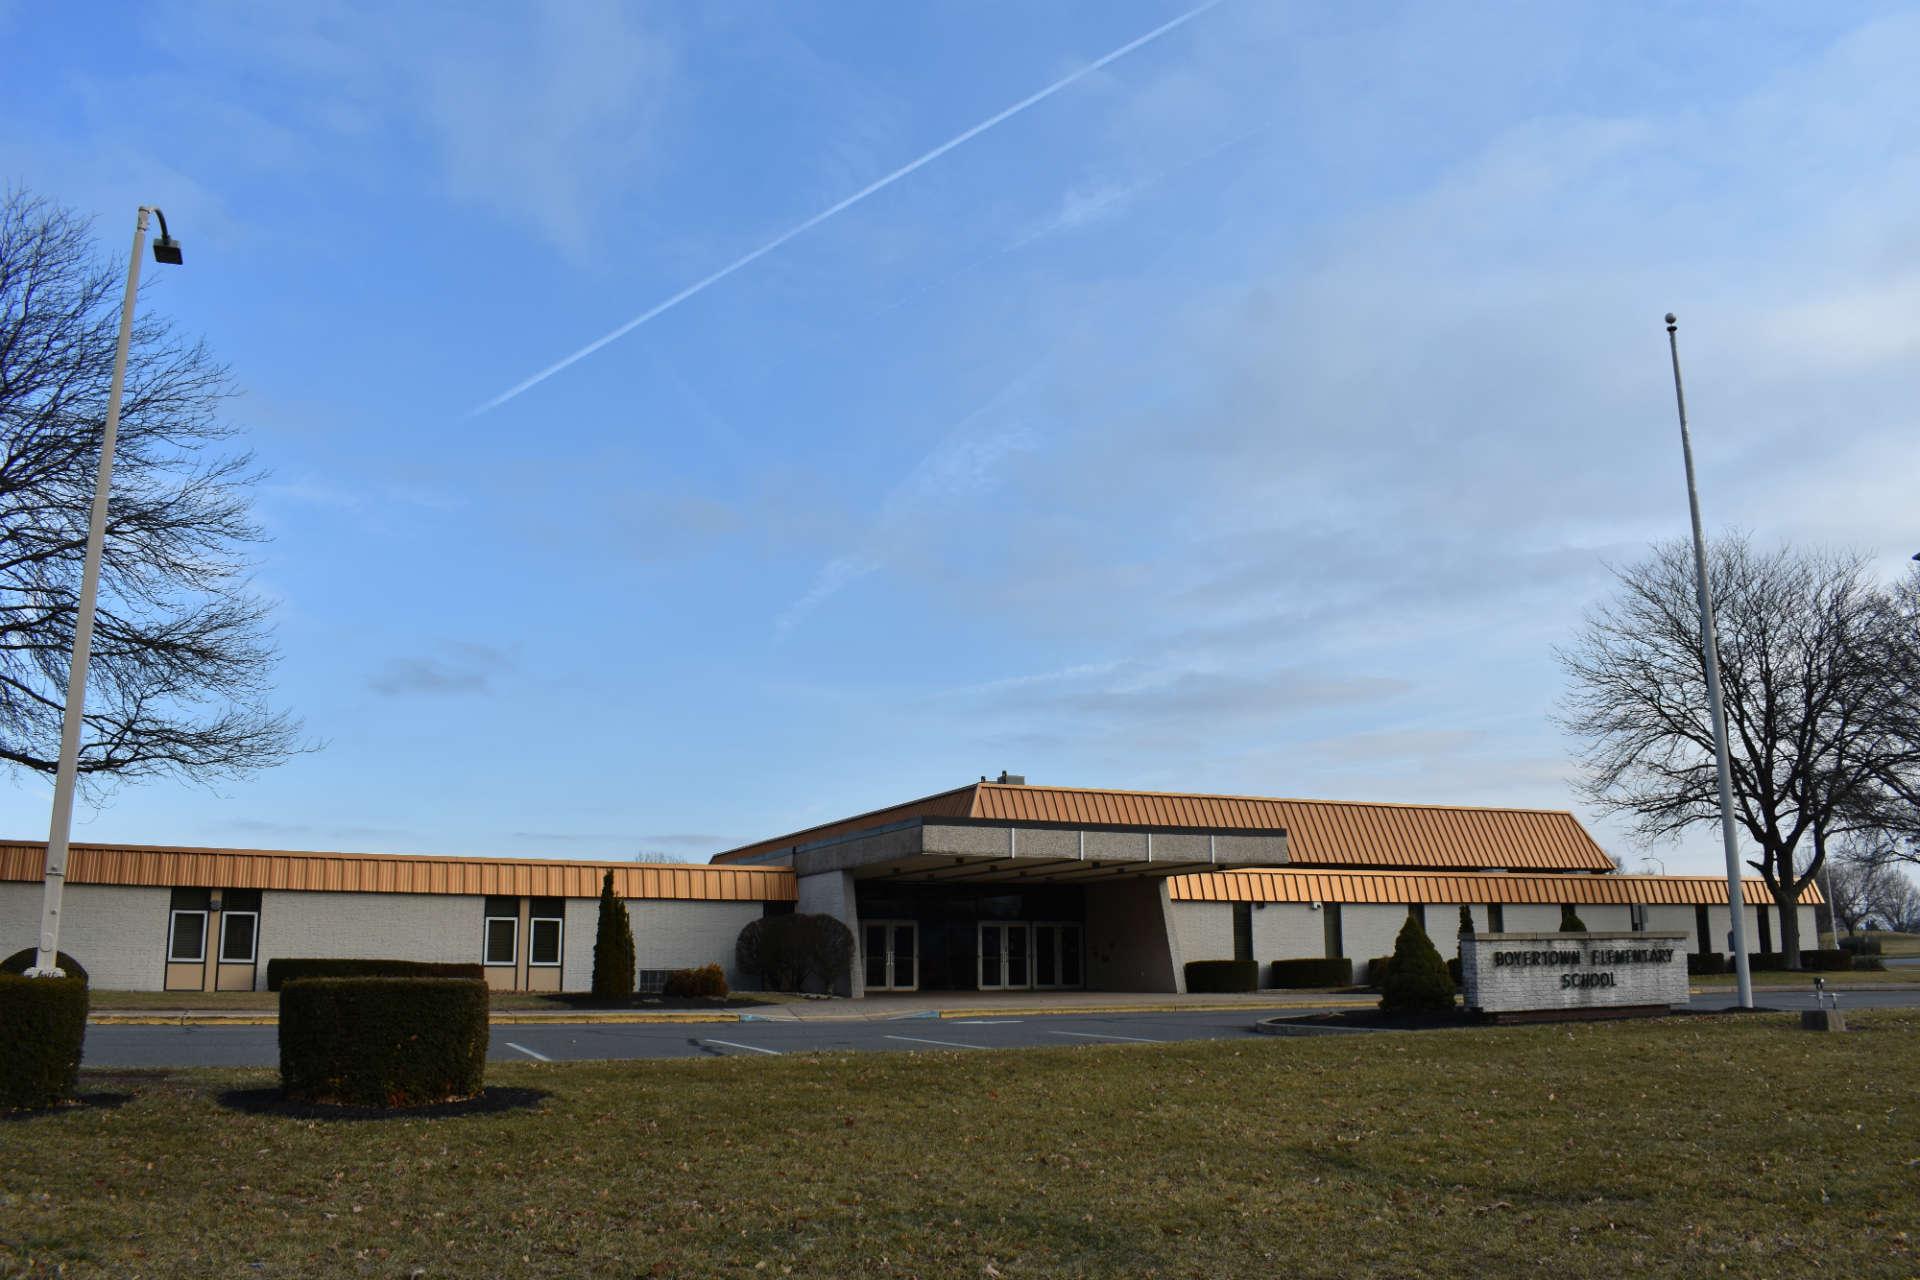 Boyertown Elementary School